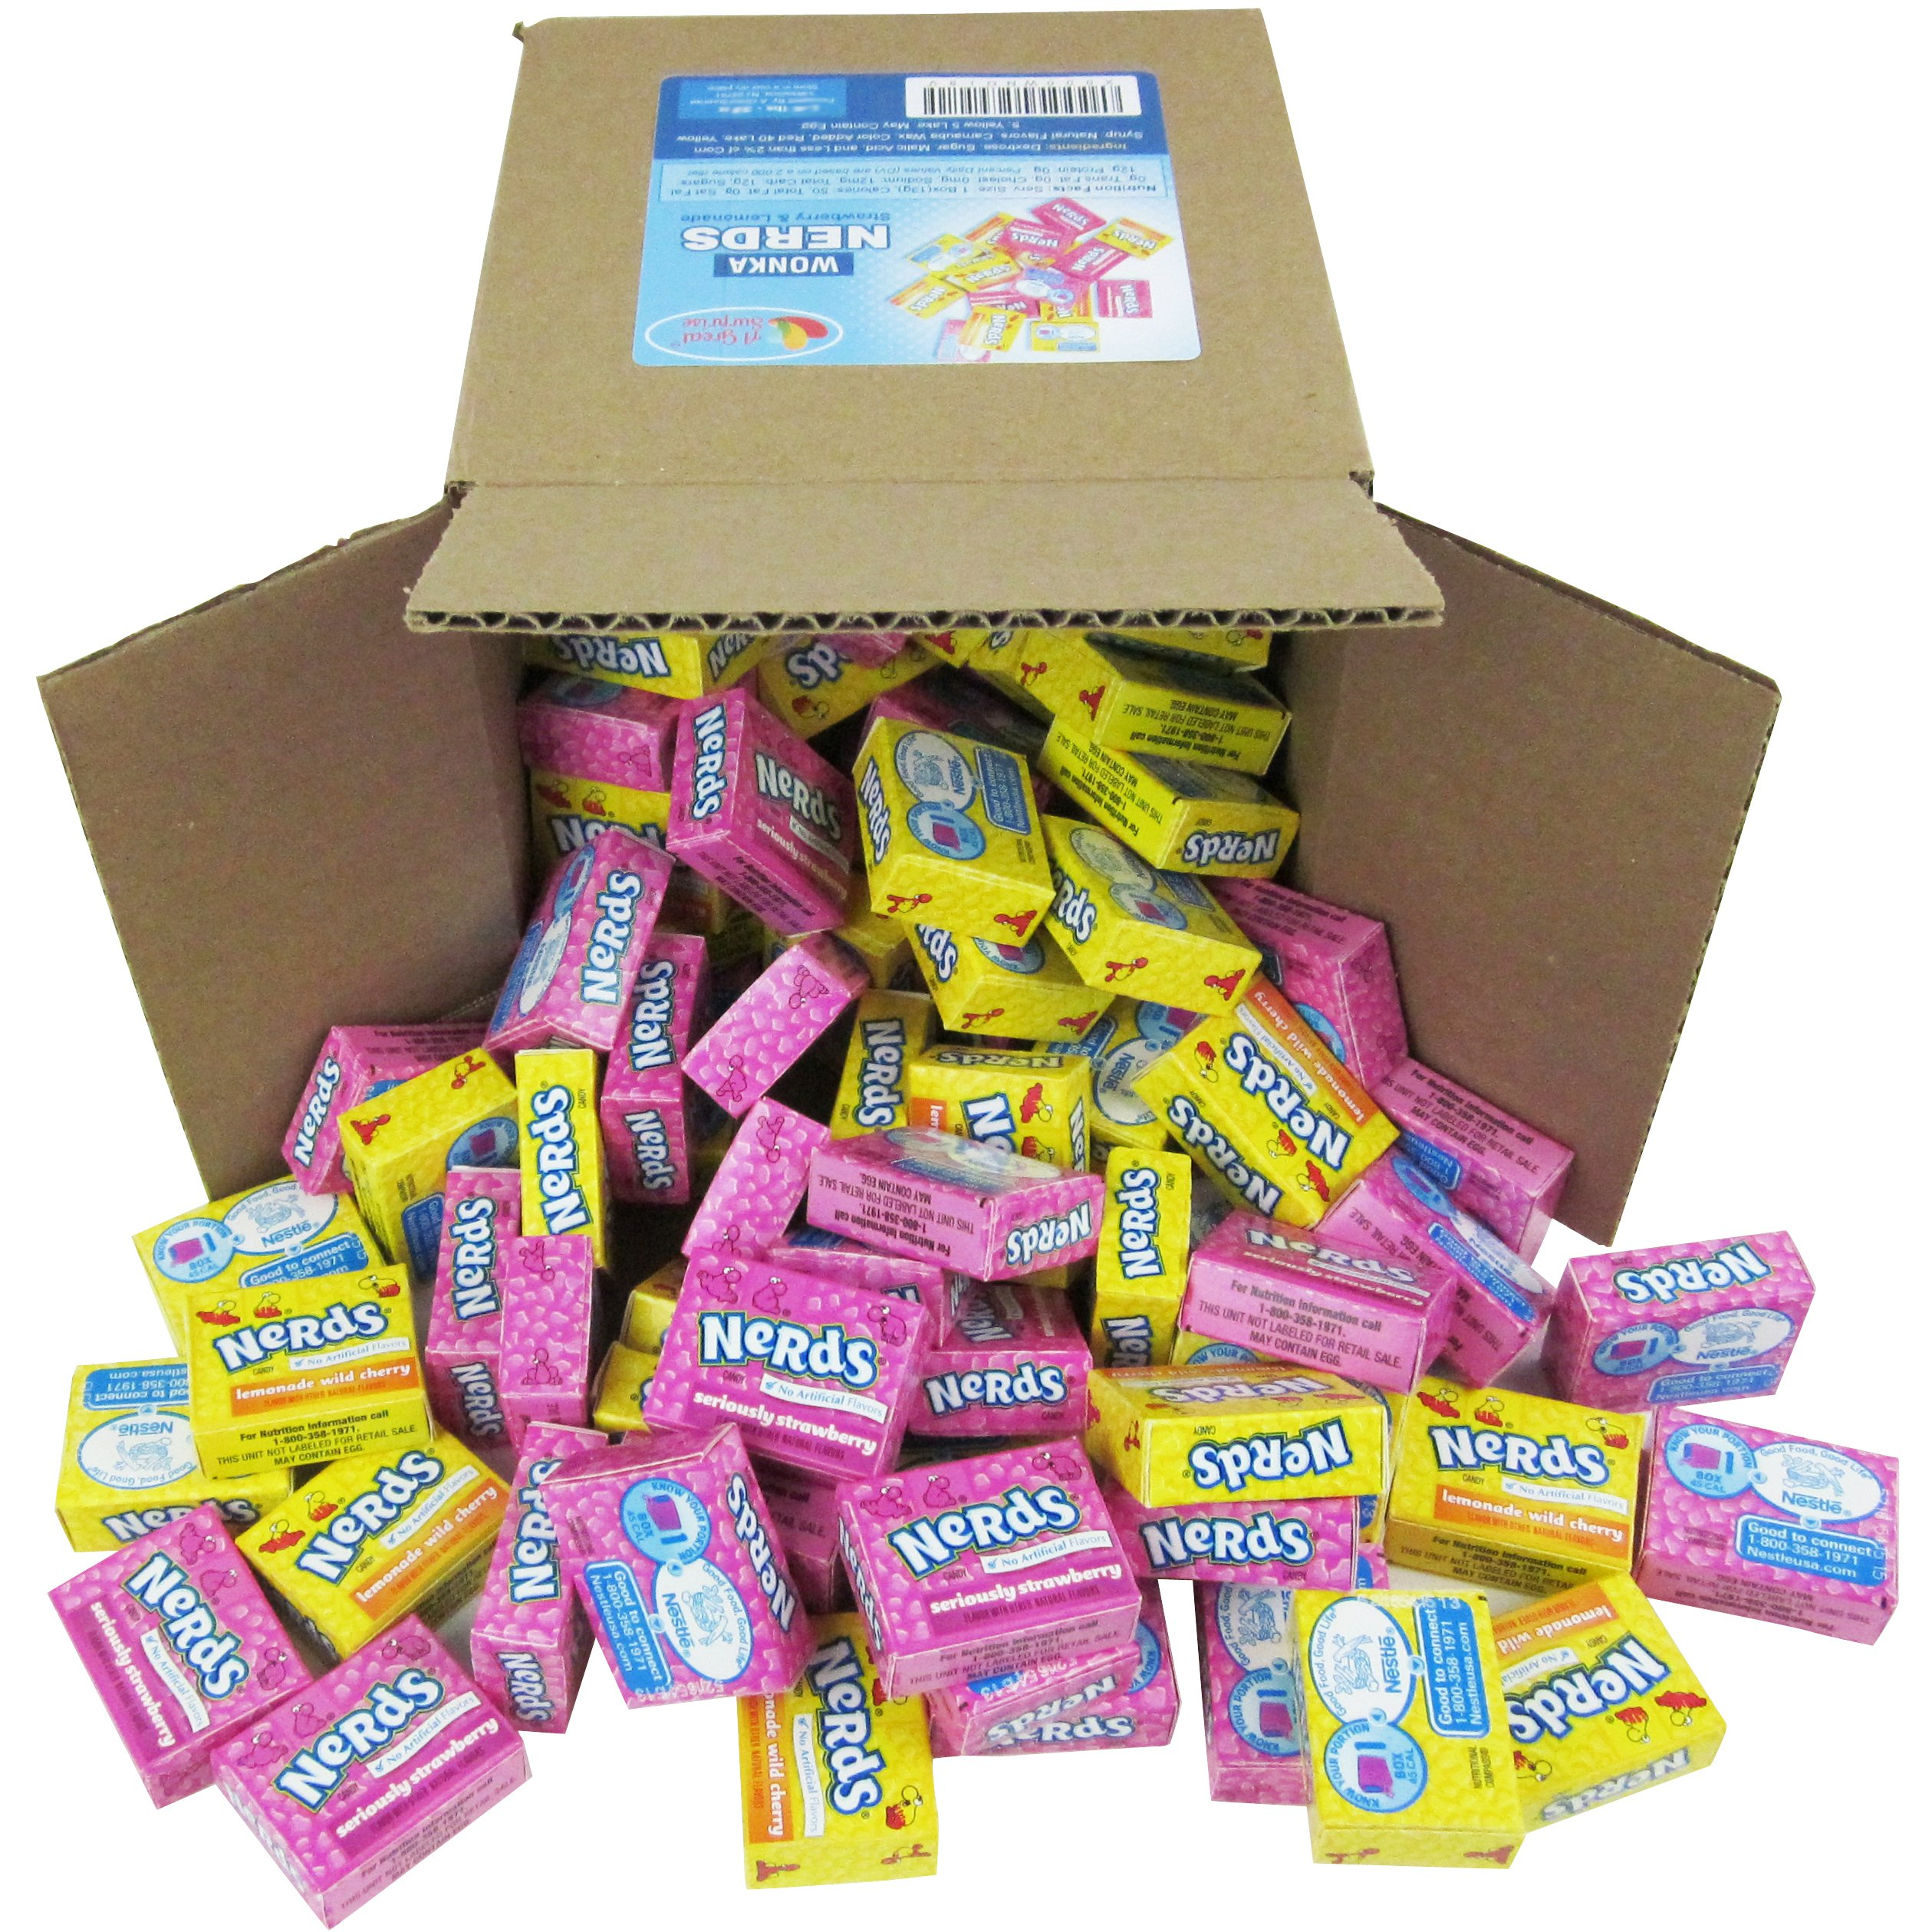 Nerds Candy - Wonka Nerds Mini Boxes, Strawberry and Lemonade Wild Cherry Assortment, 4LBS Box Bulk Candy (Approx. 100 Mini Boxes)